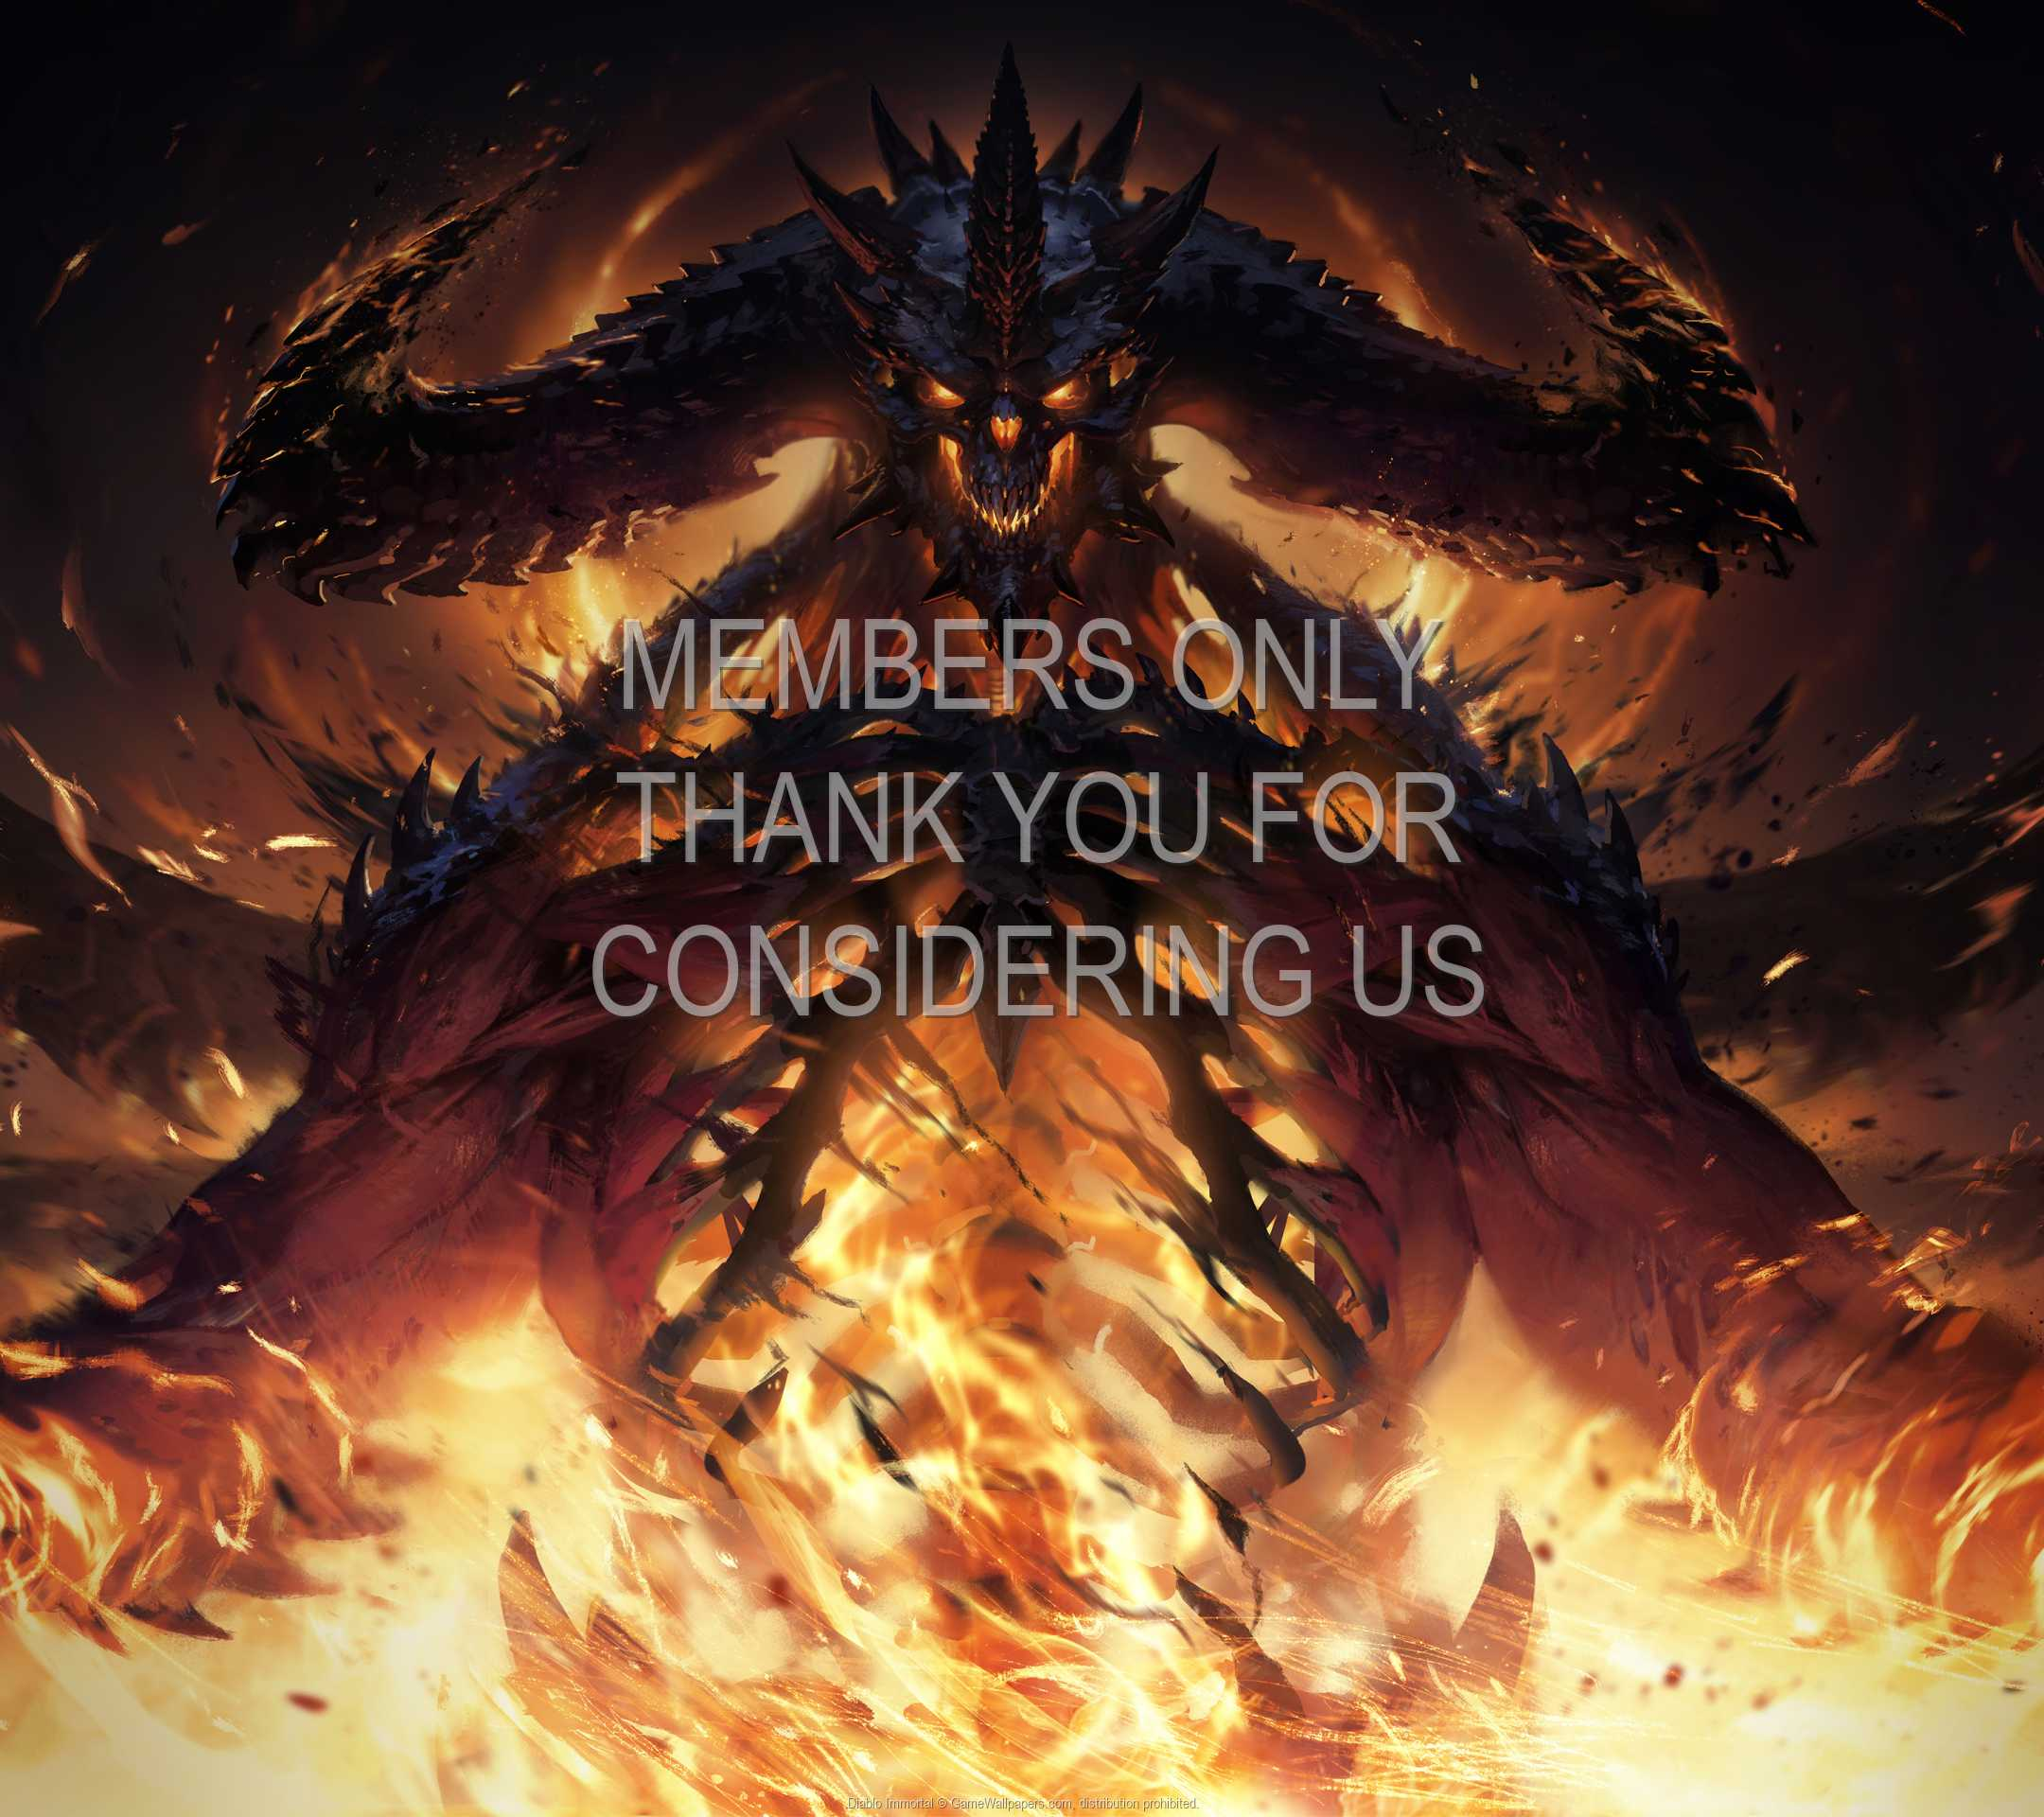 Diablo Immortal 1080p Horizontal Mobile wallpaper or background 01